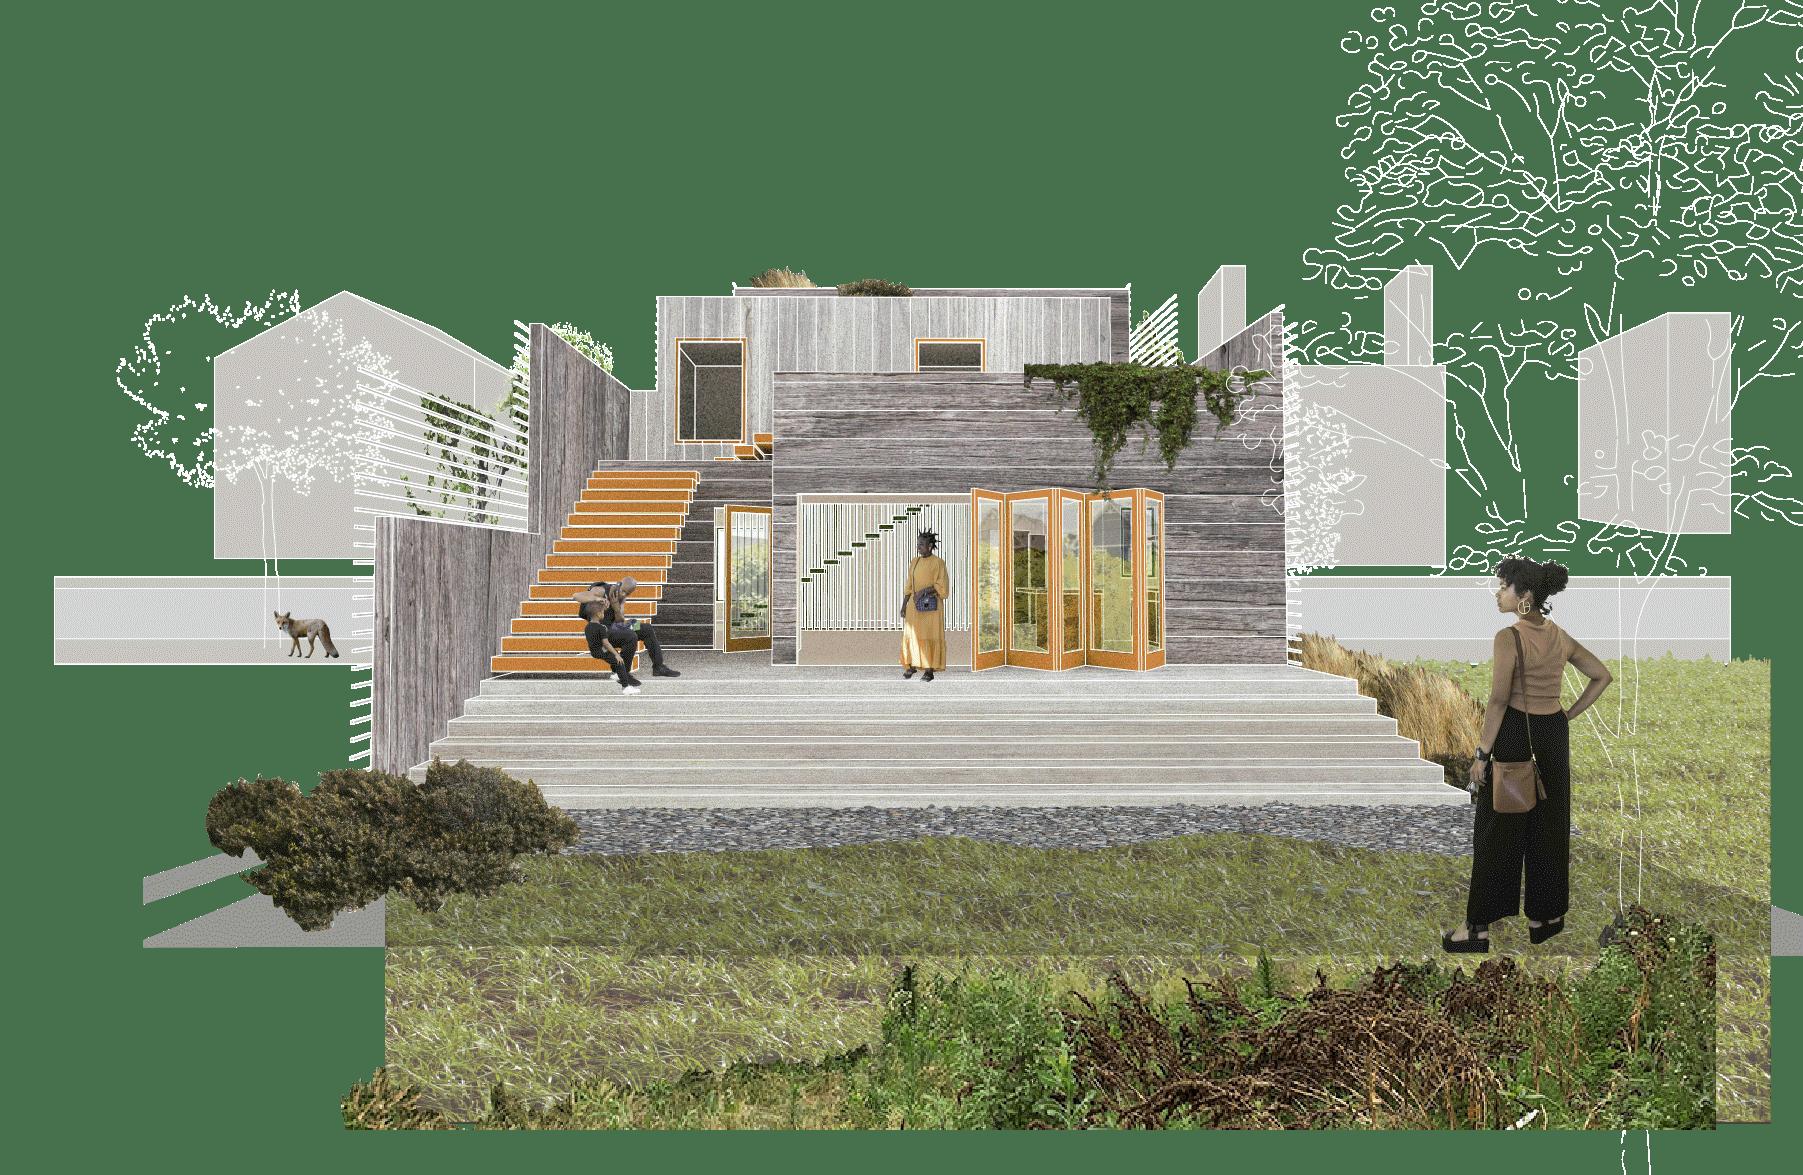 Land lot, Urban design, Building, Plant, Biome, Grass